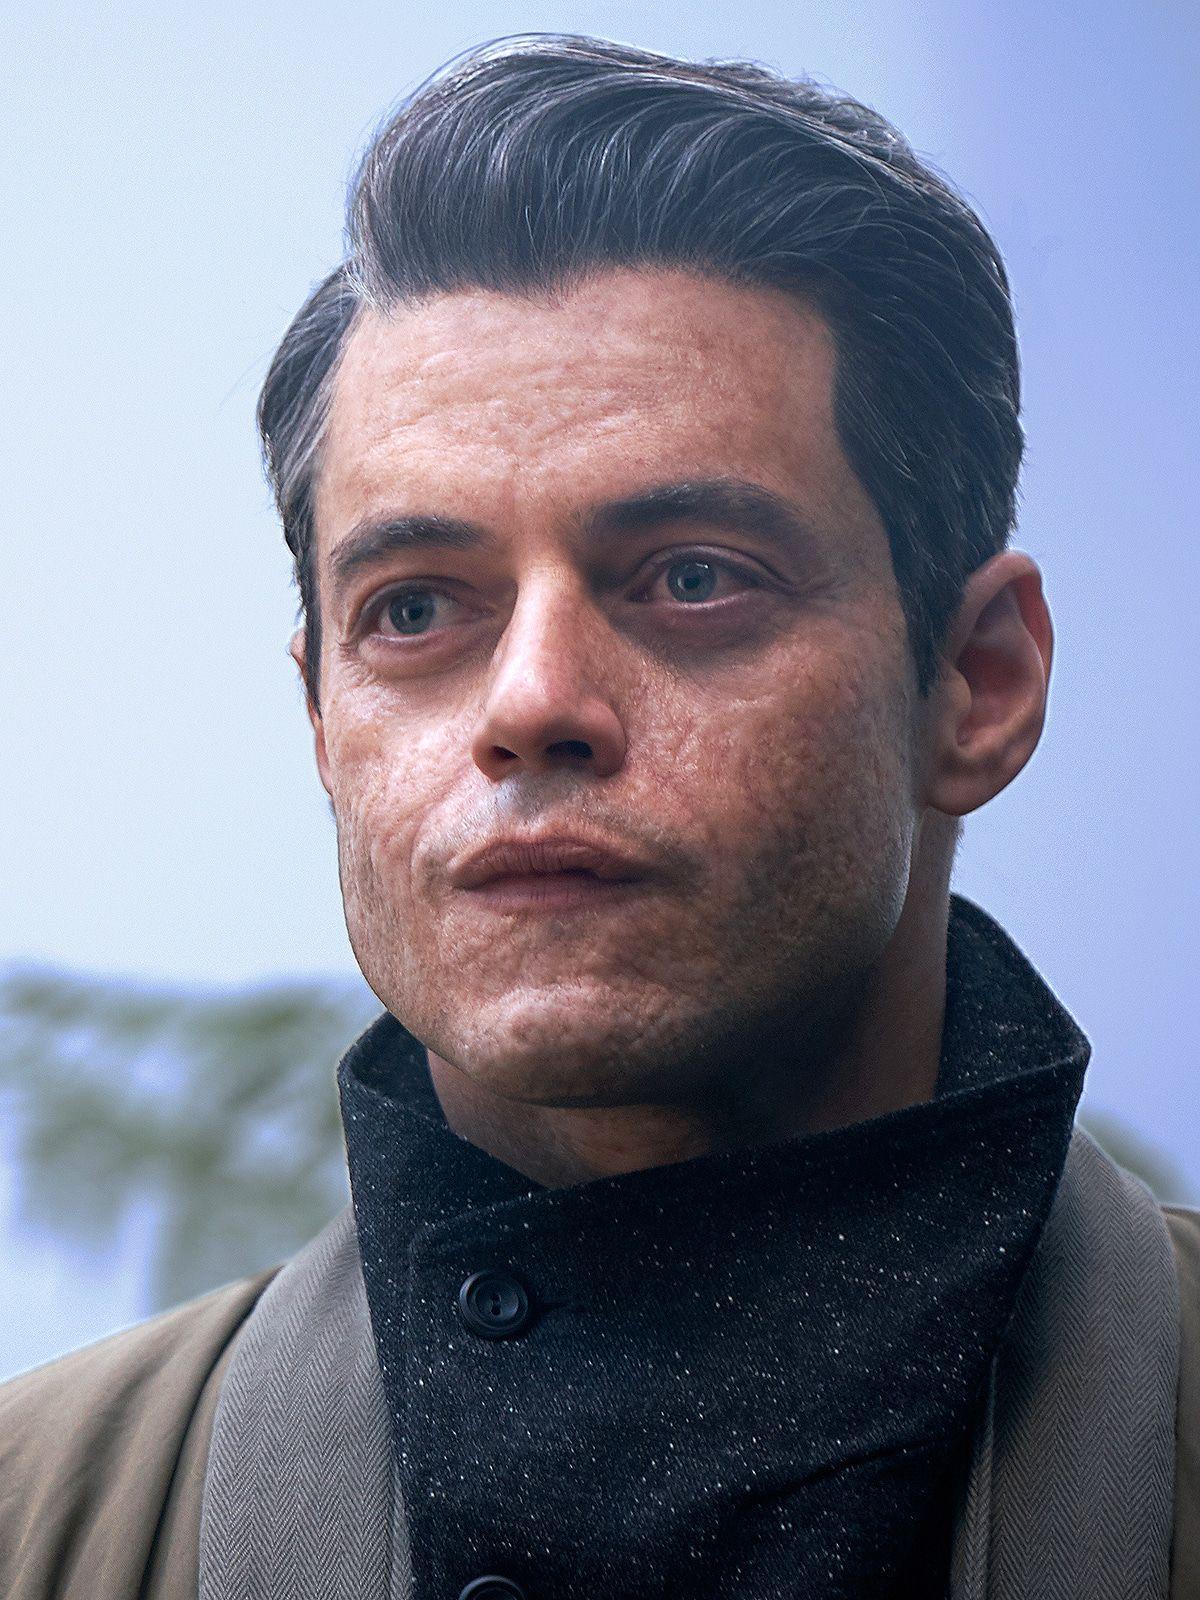 Rami Malek: Der neue Bond-Bösewicht Rami Malek will dem Publikum Angst machen